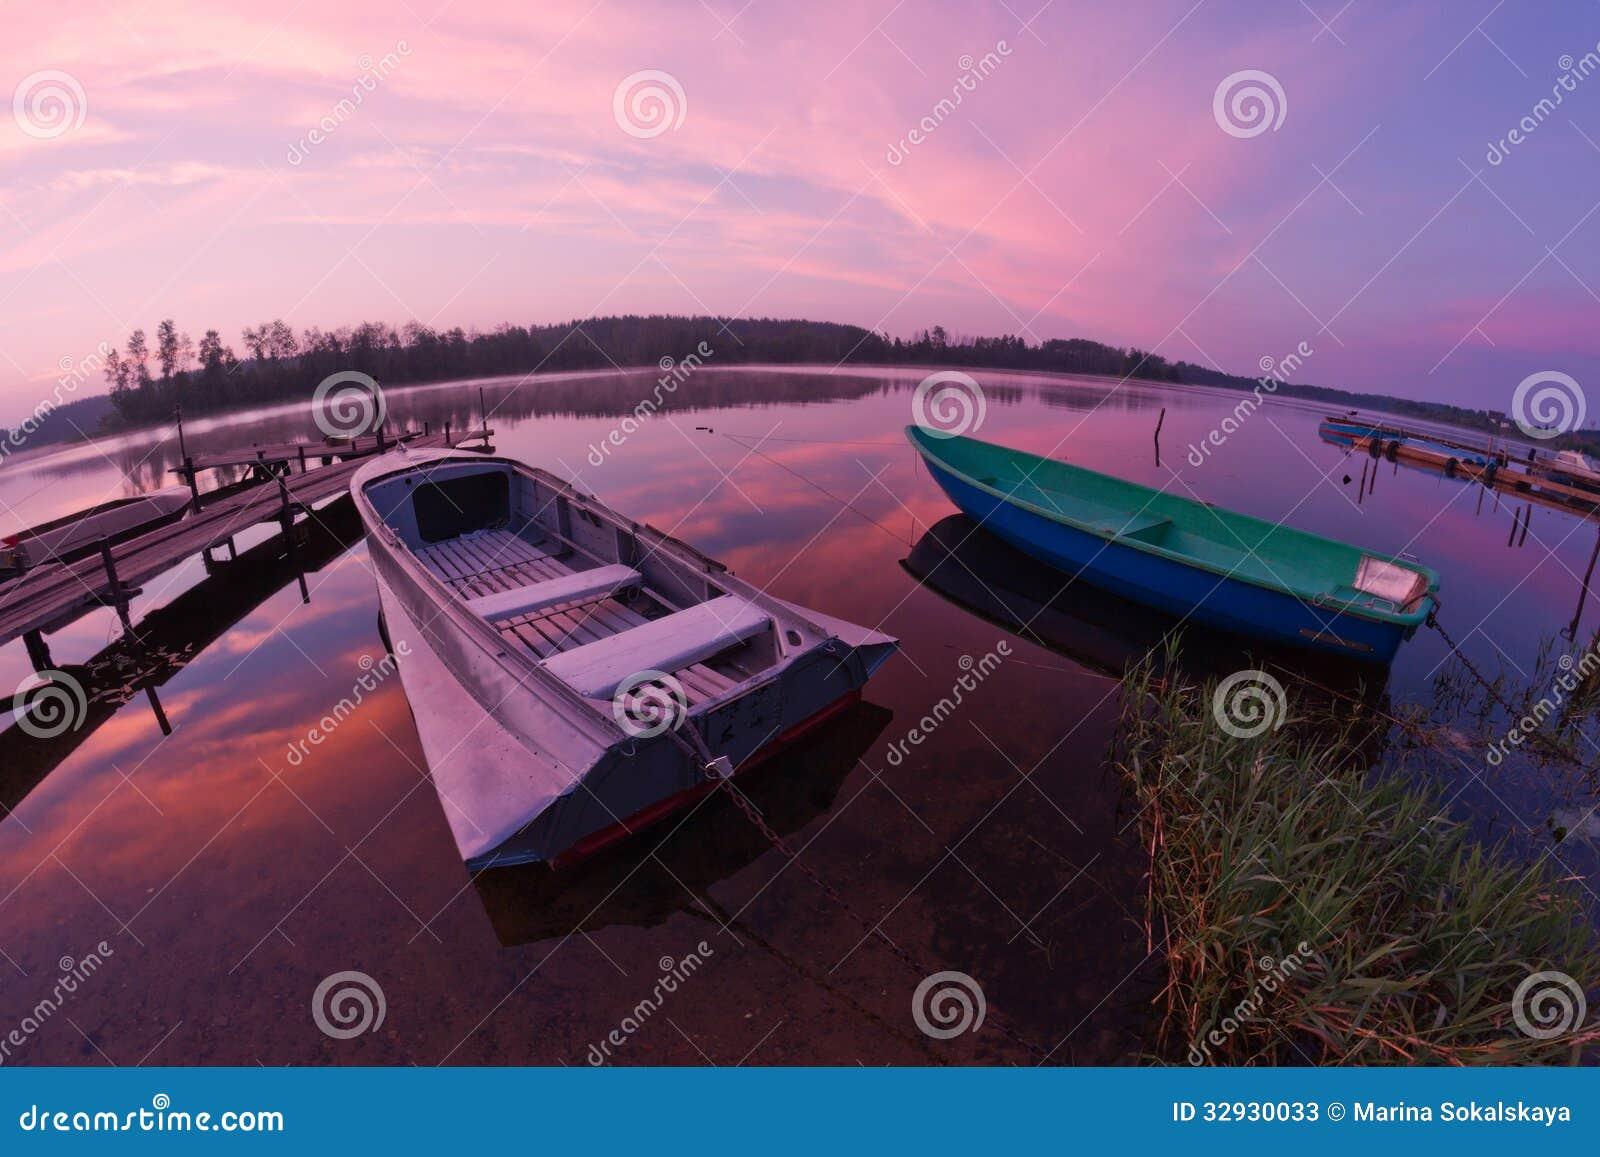 Seliger湖:小船日出